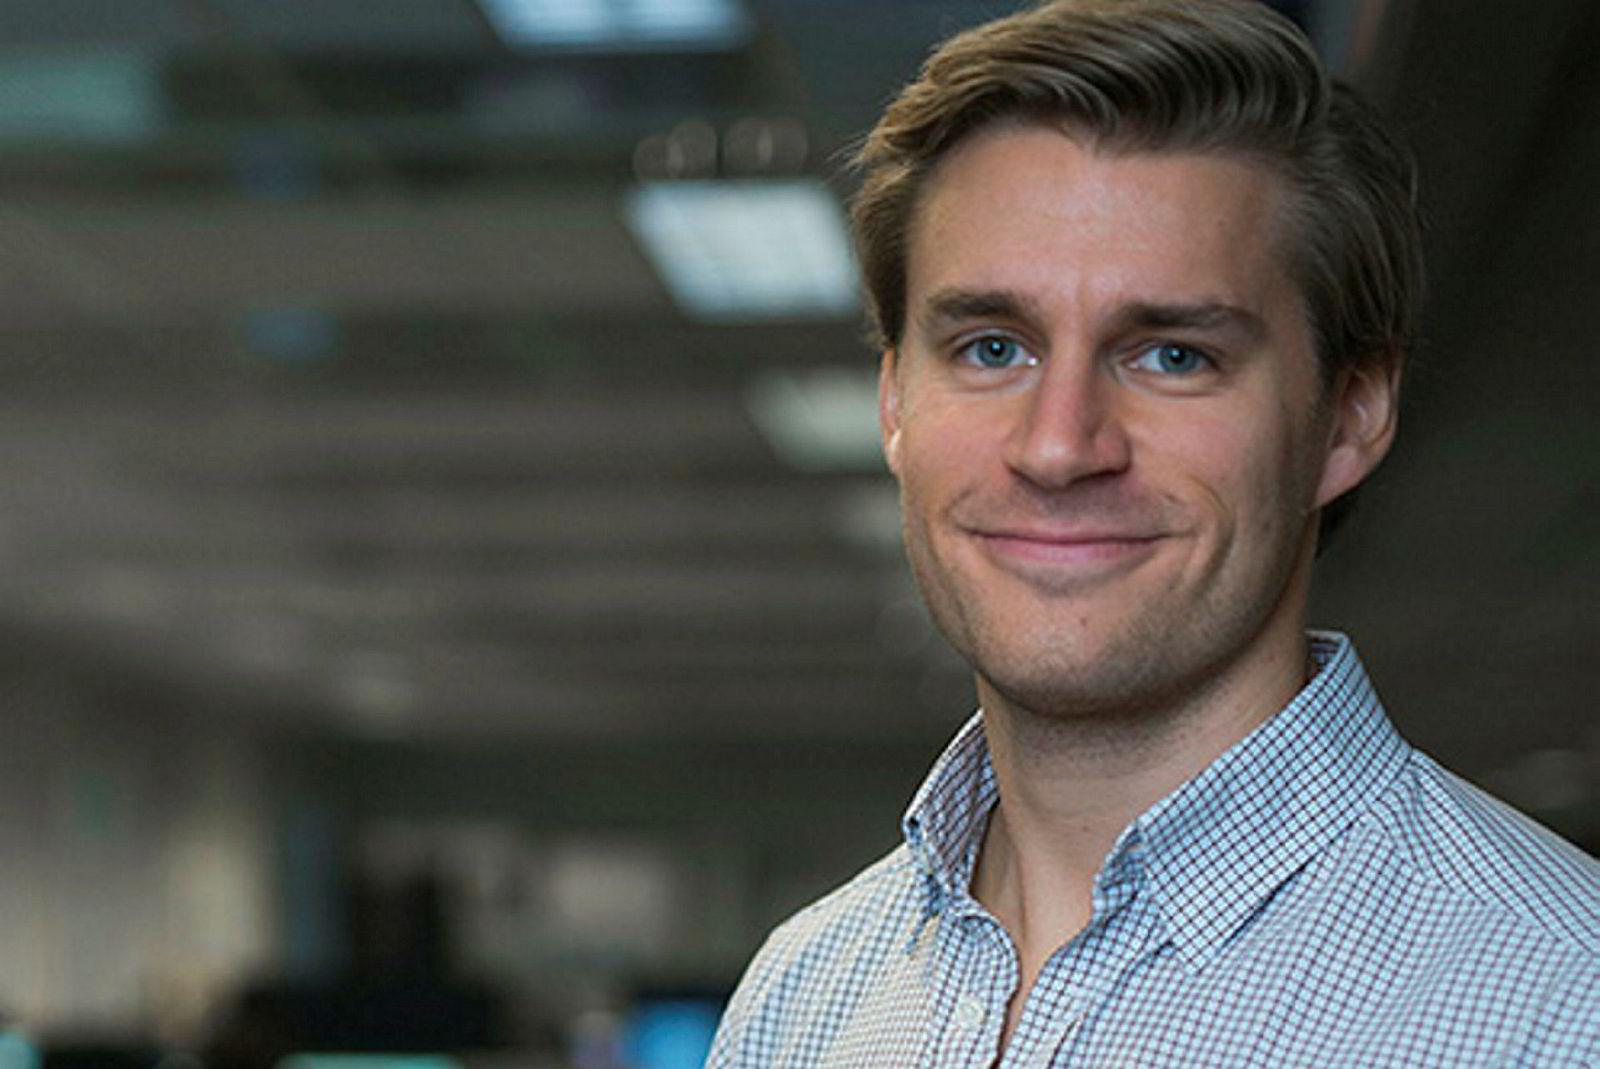 Kristian Fredheim er kommunikasjonsrådgiver i Telia Norge.